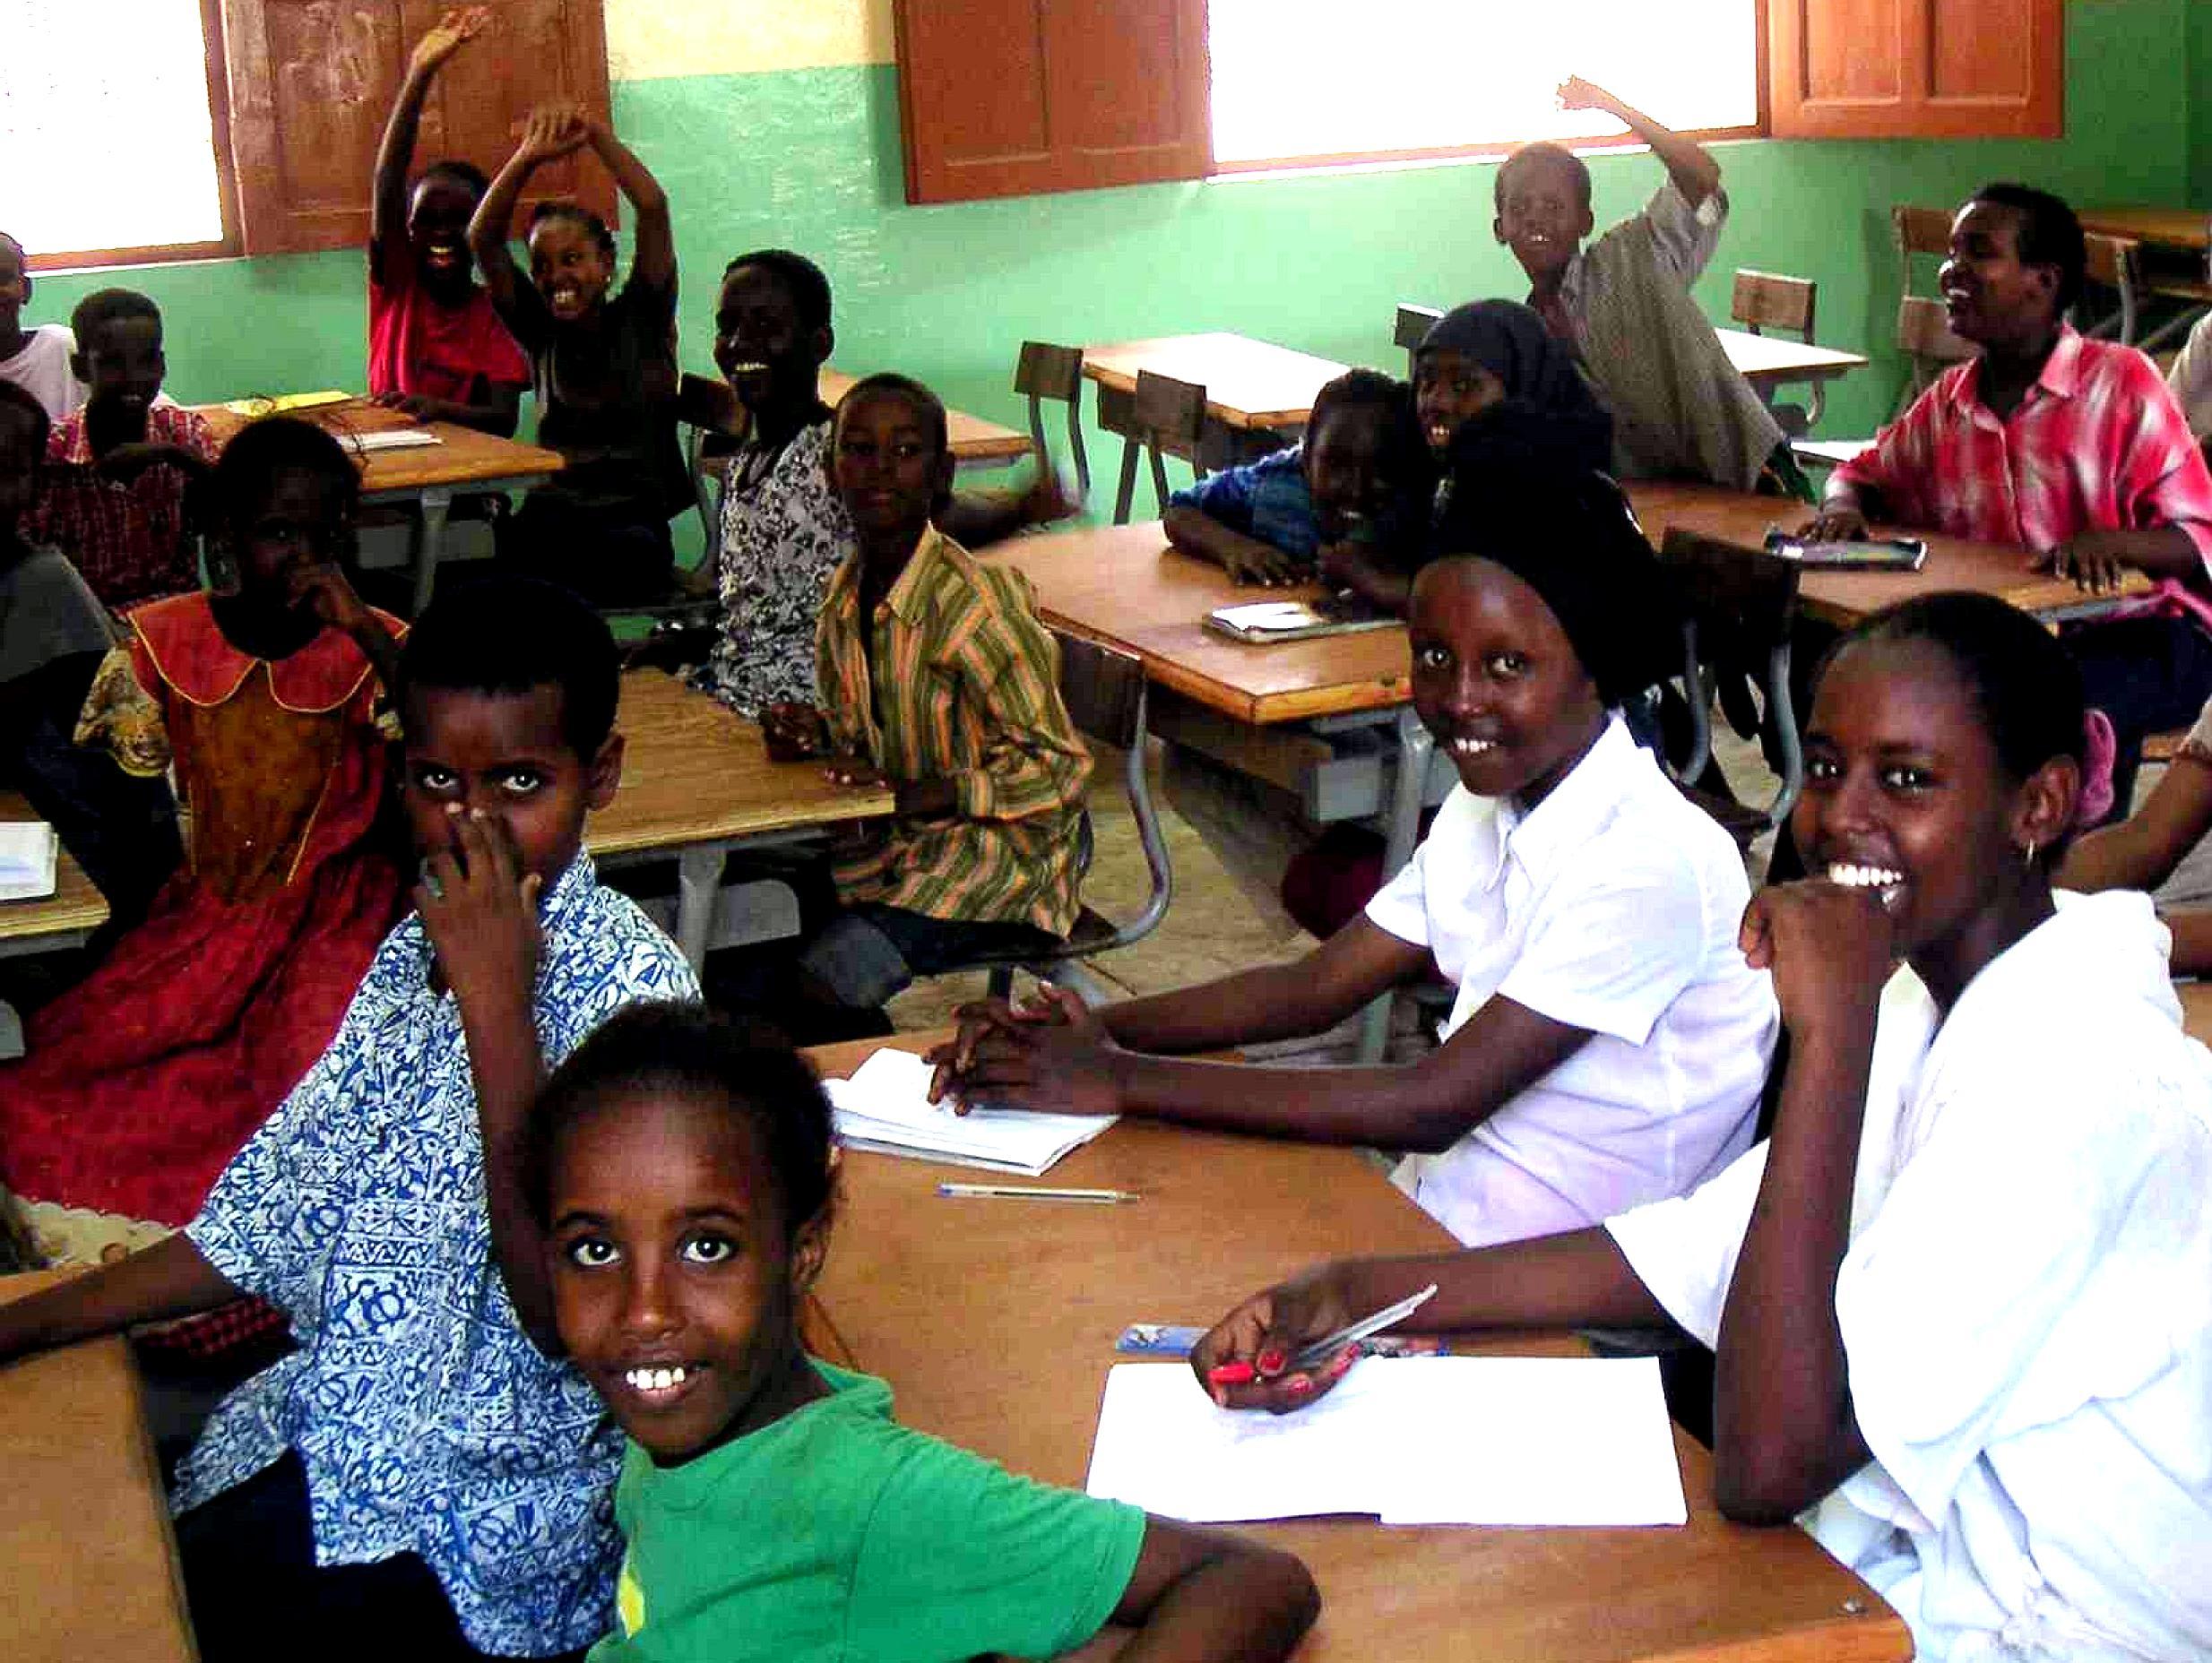 Free picture: children, primary school, Djibouti, Africa